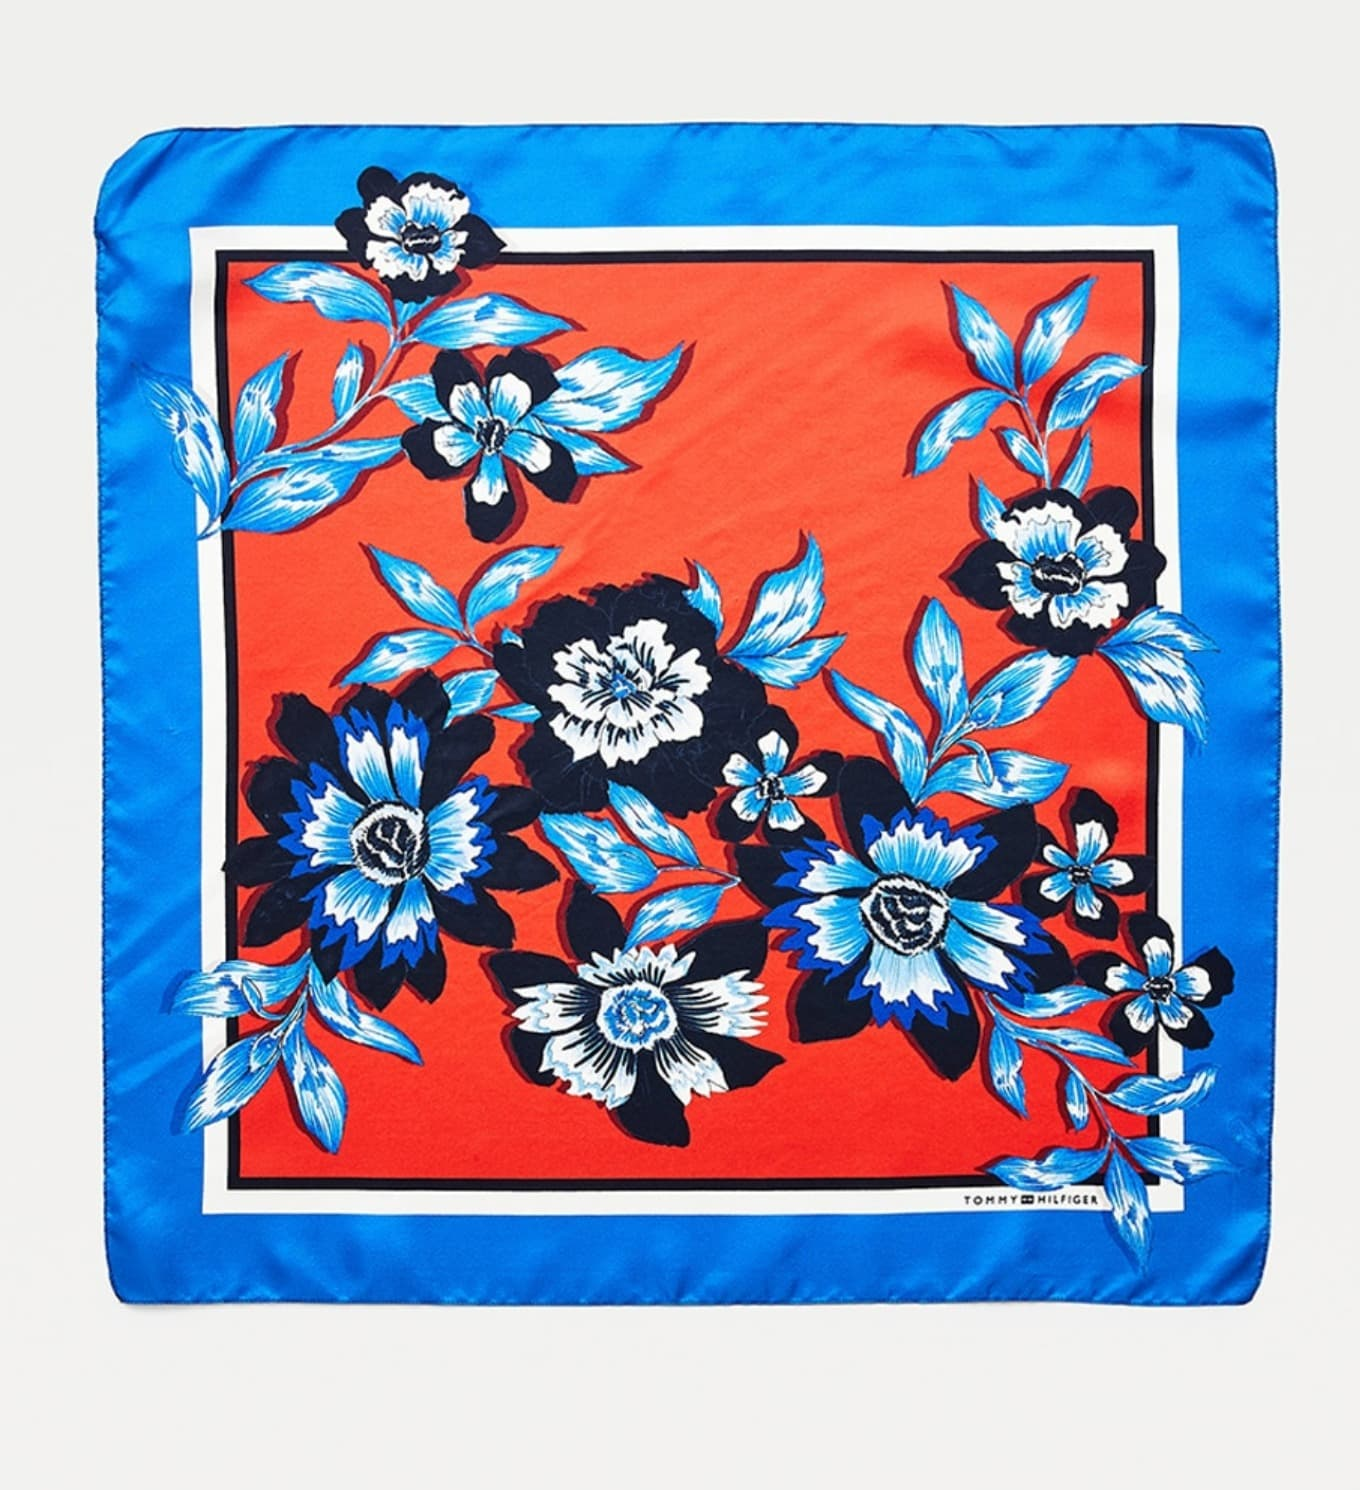 Pañuelo de mujer Tommy Hilfiger azul claro